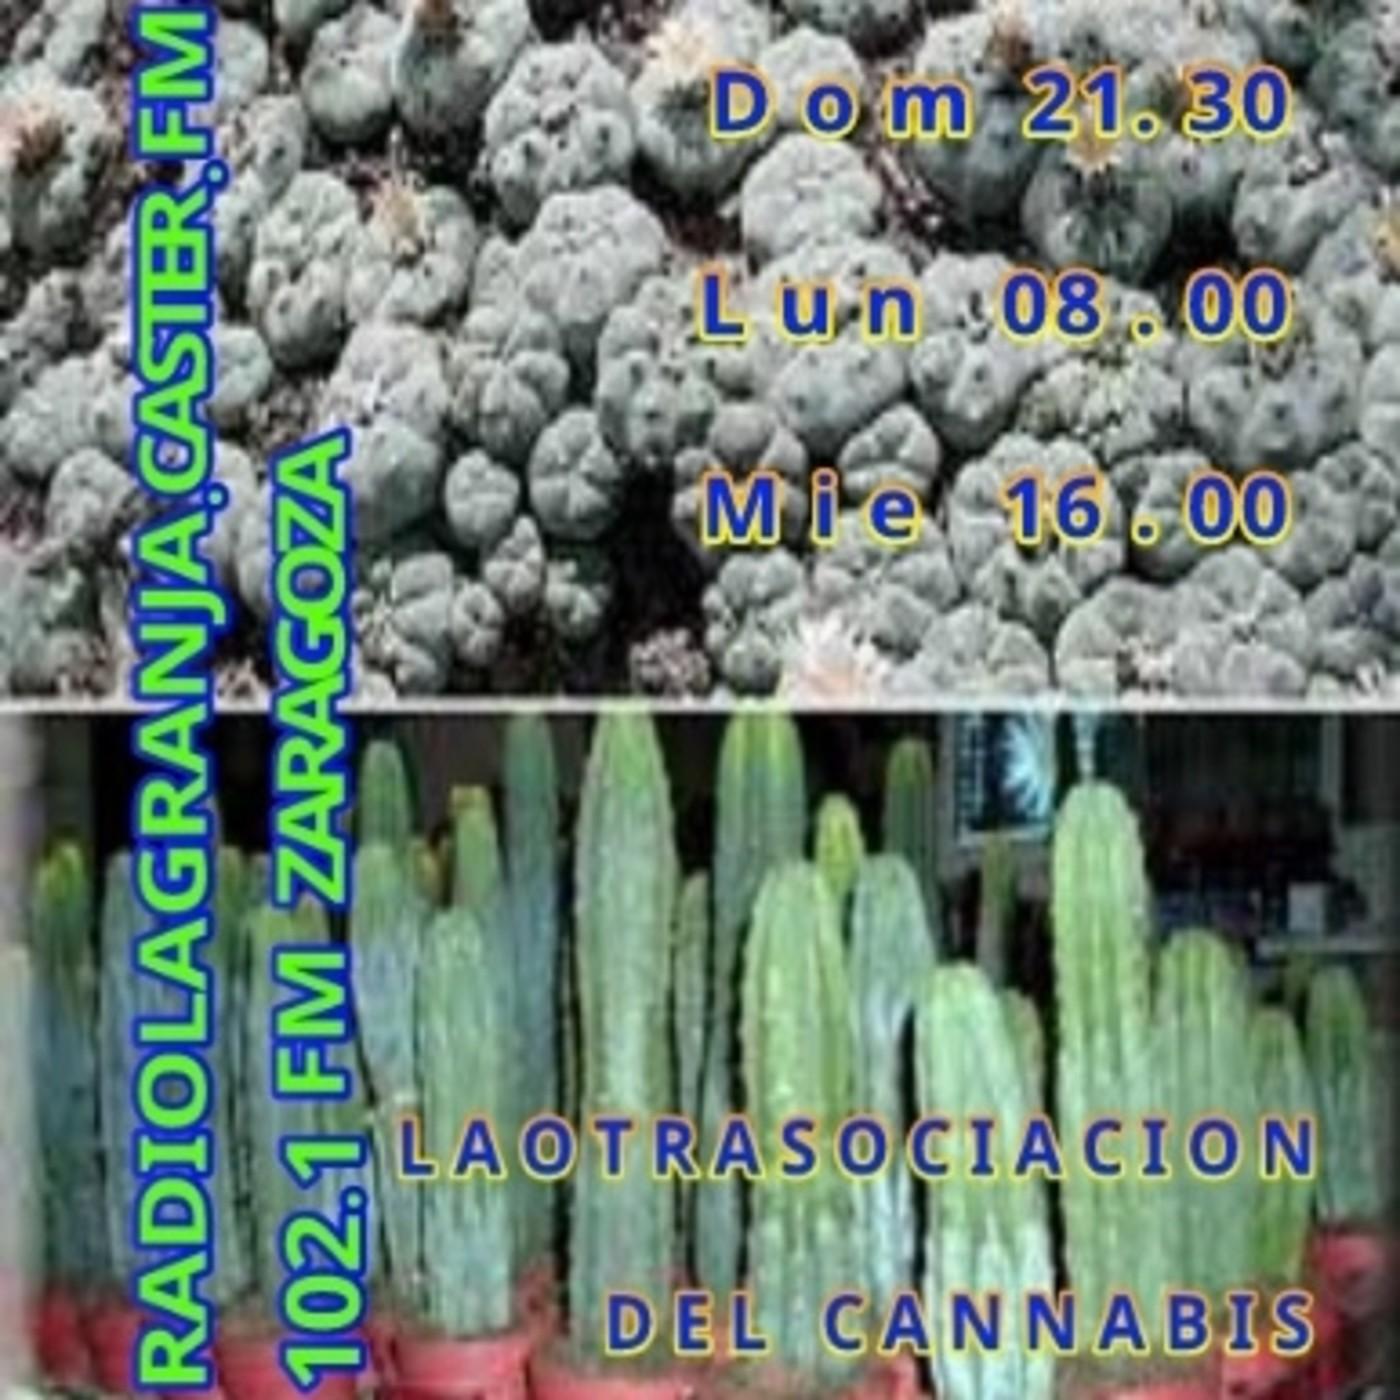 Jardines de Dios - Documental sobre drogas naturales